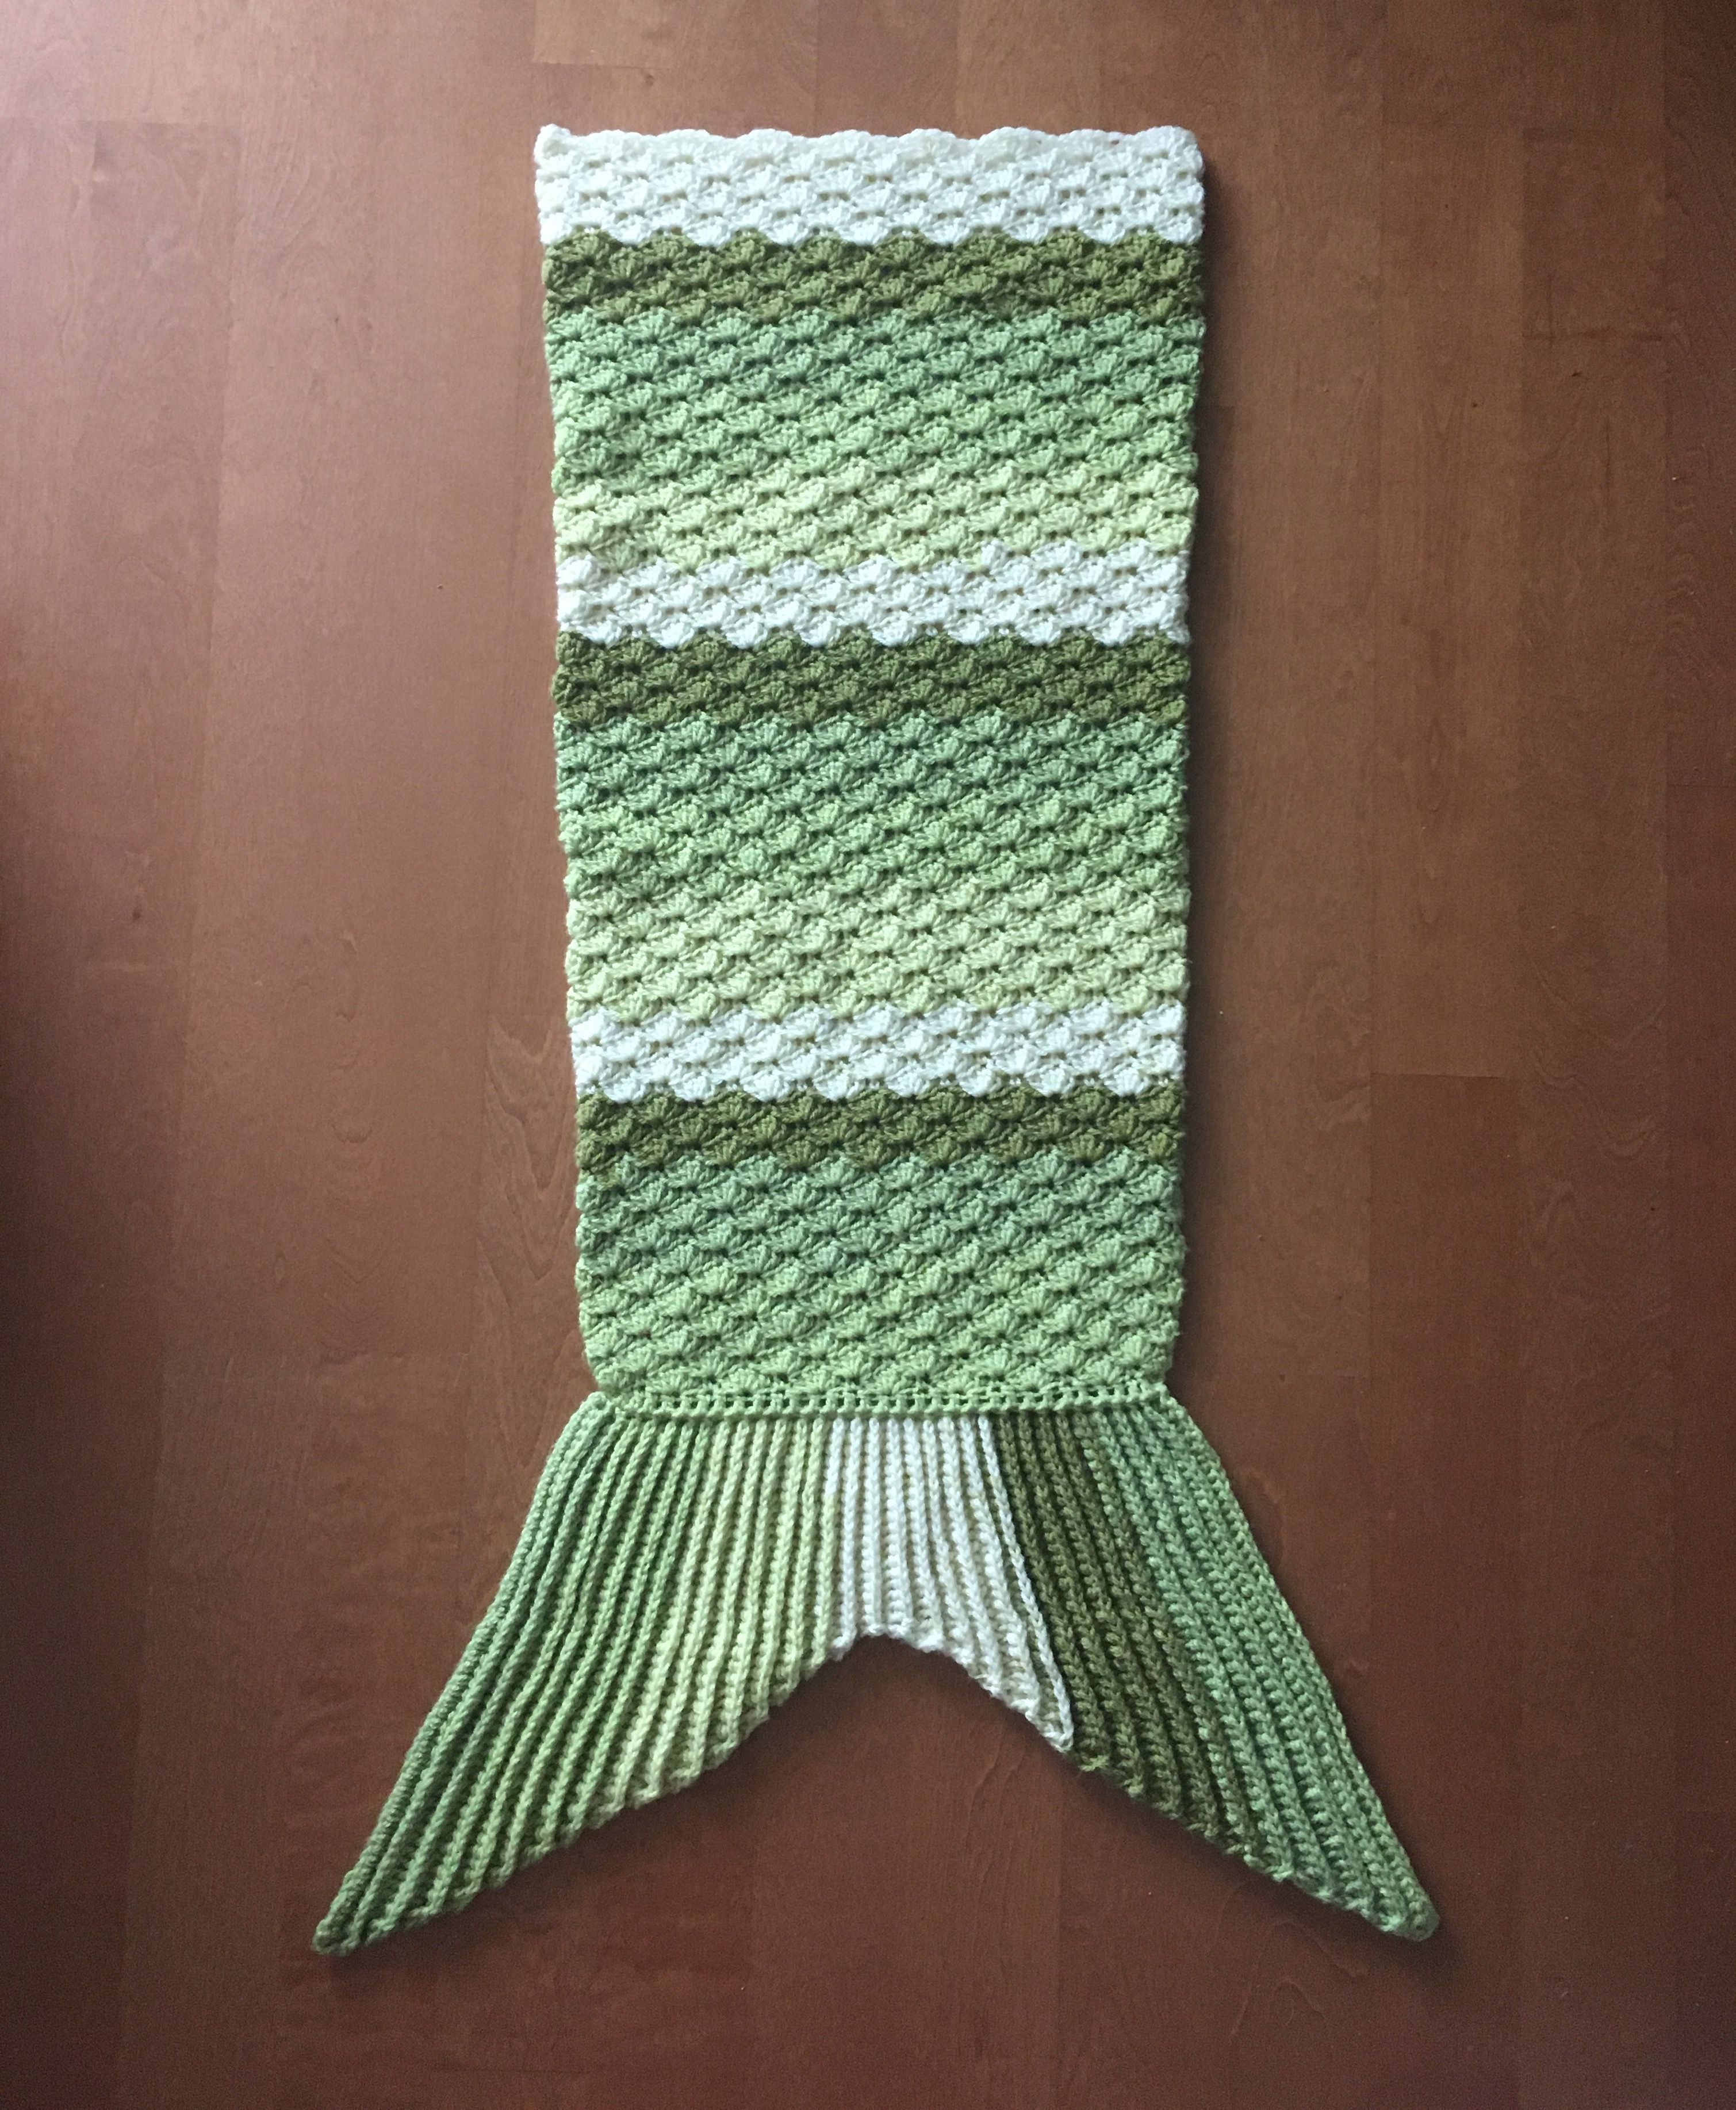 Crochet Mermaid Tail Blanket using Caron Cakes Pattern